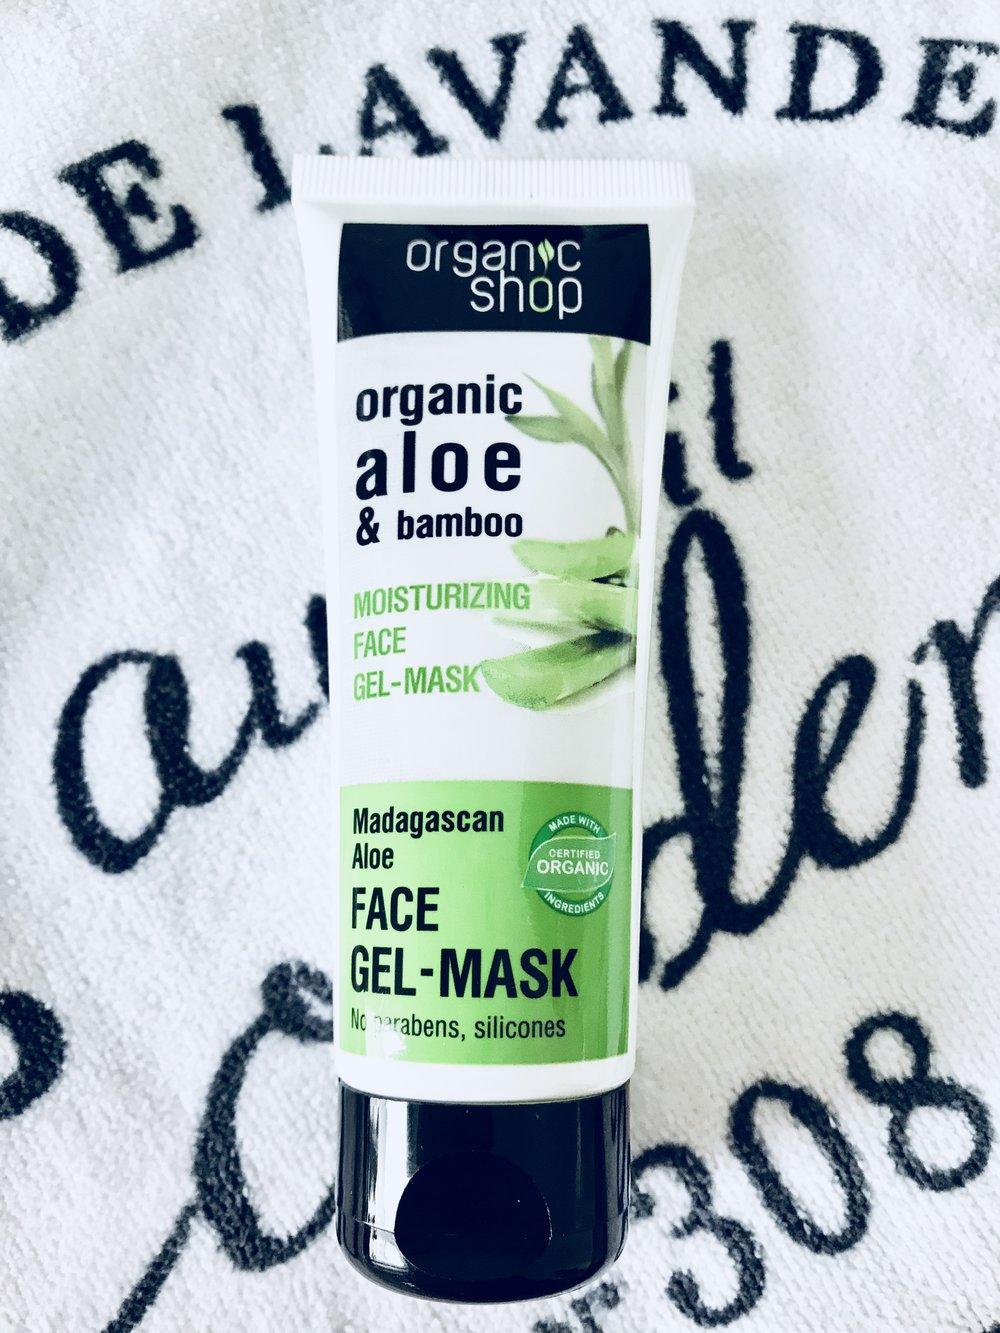 Organic Shop moisturizing face mask